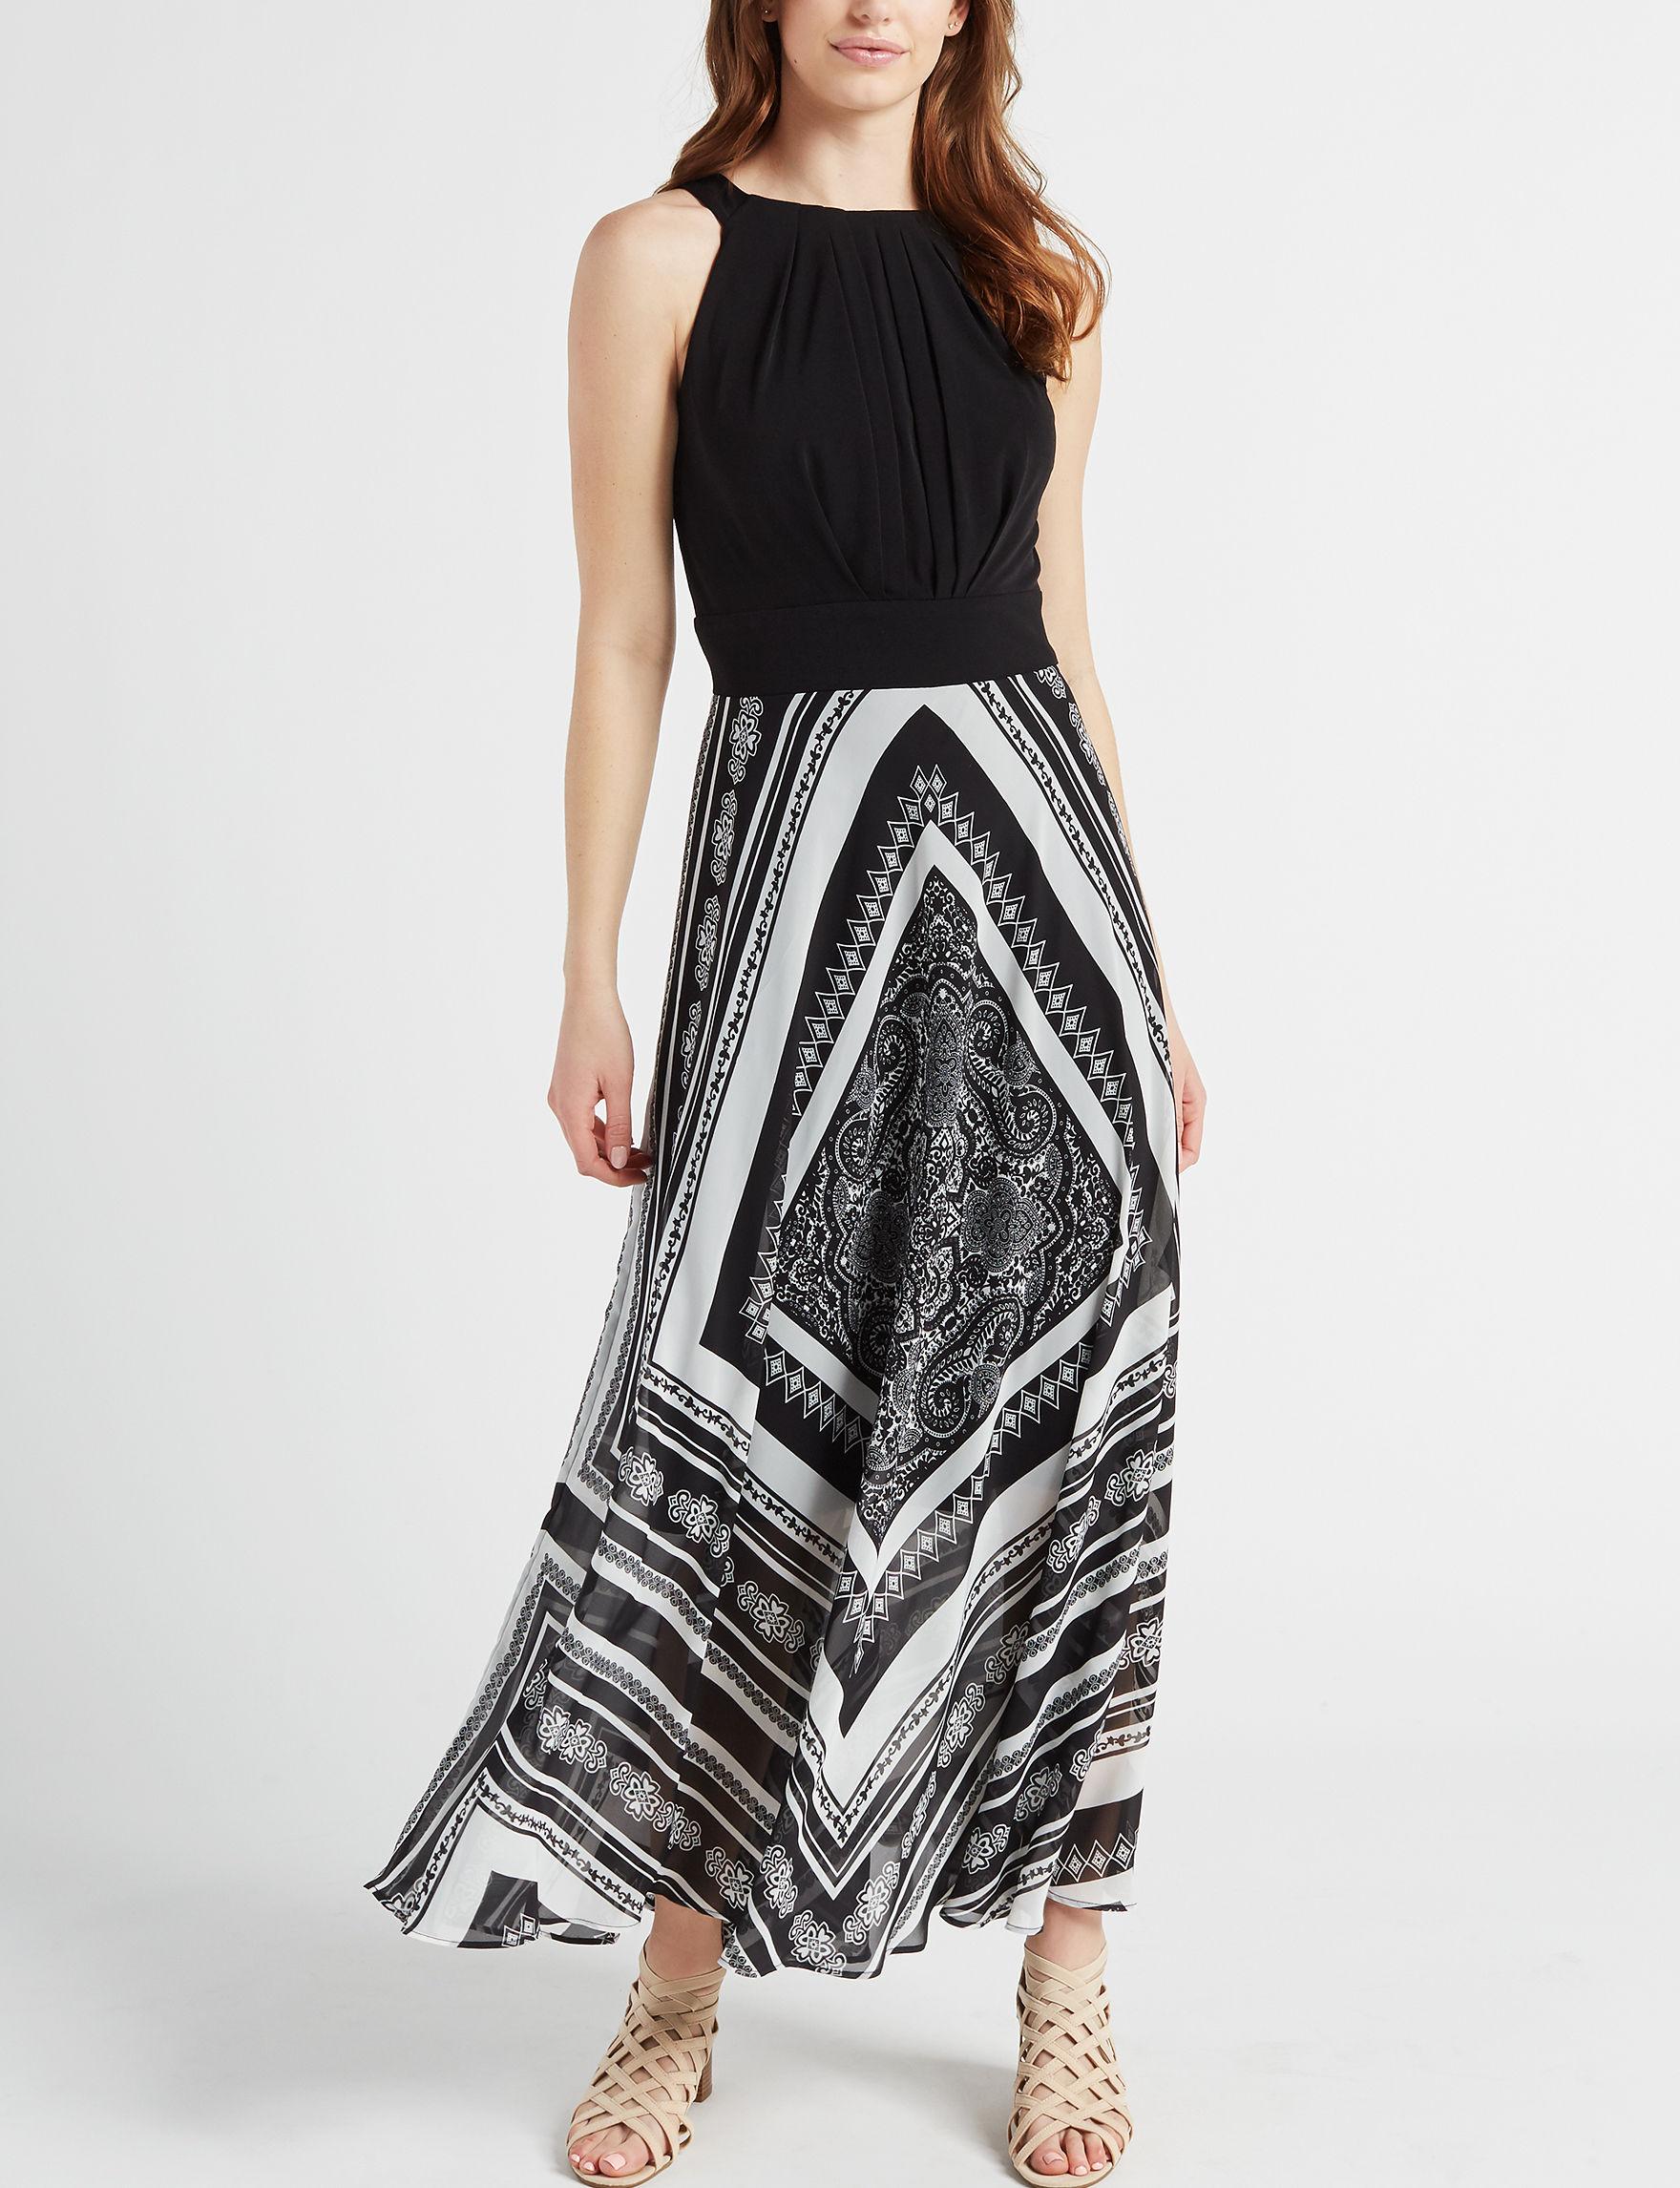 Sandra Darren Black White Everyday & Casual Maxi Dresses